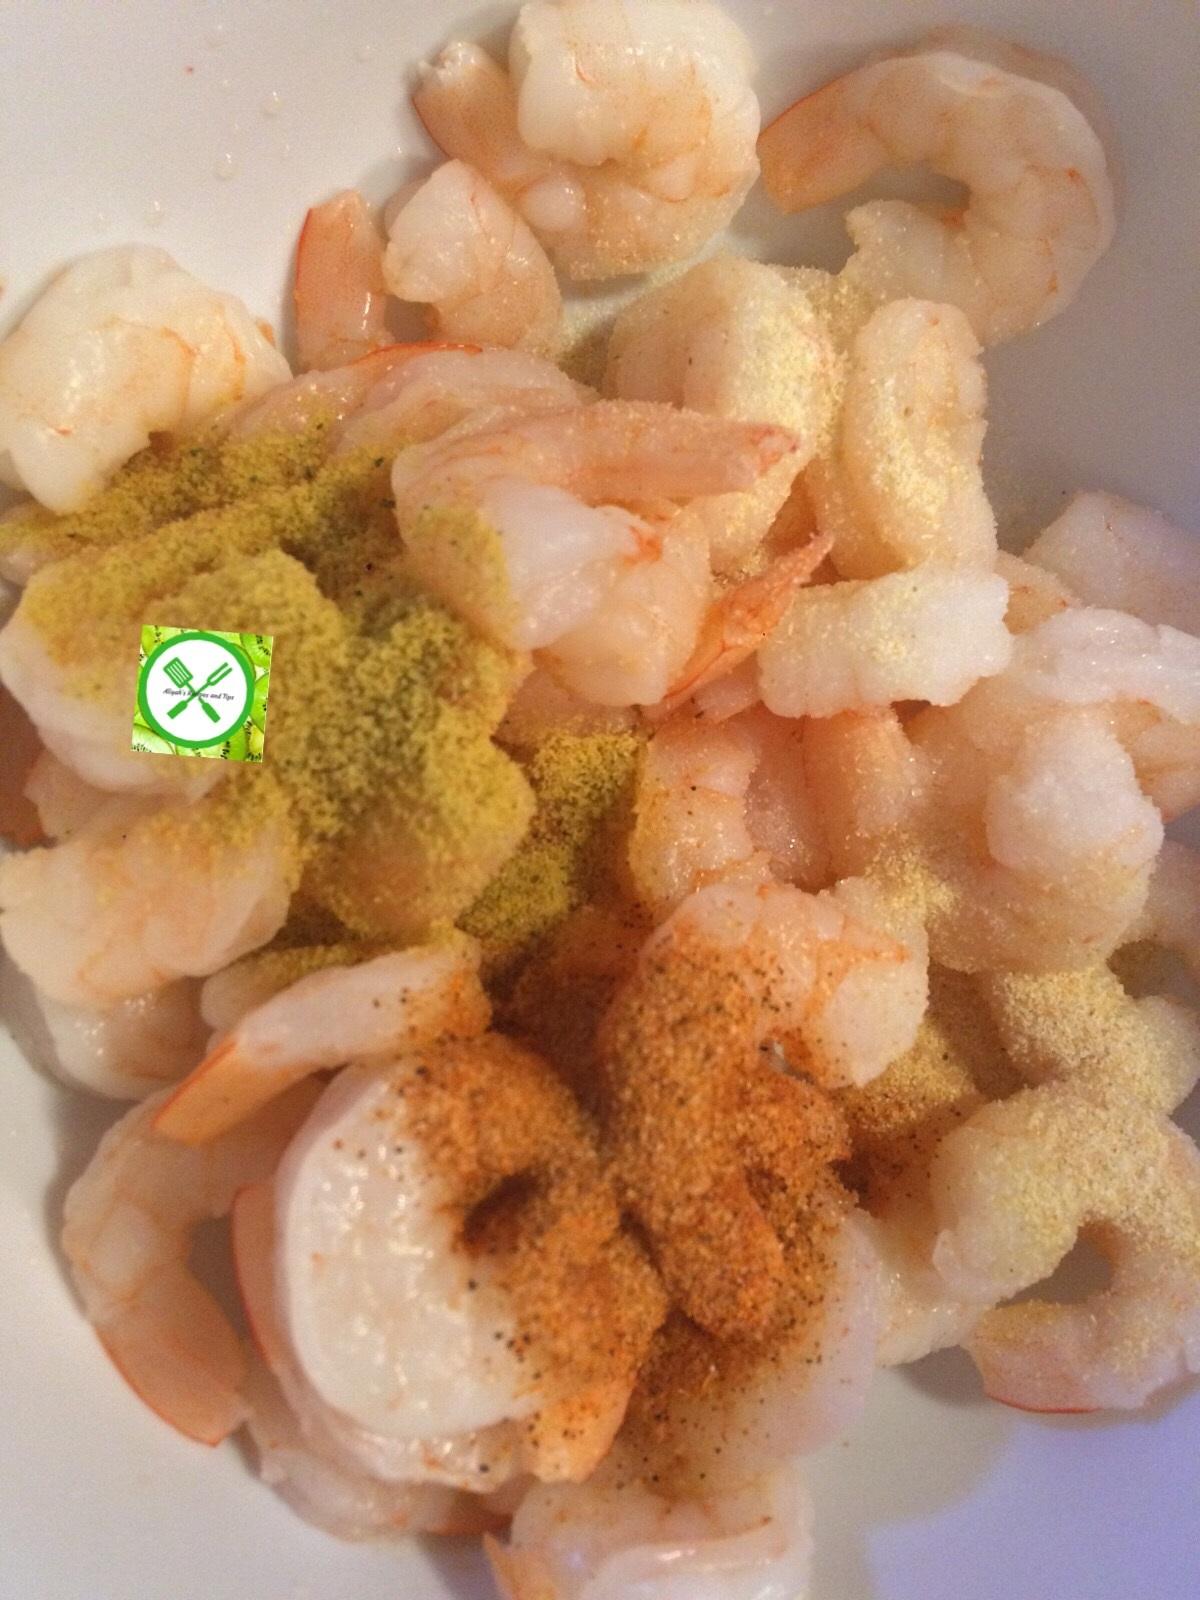 shrimp tacos add seasonings